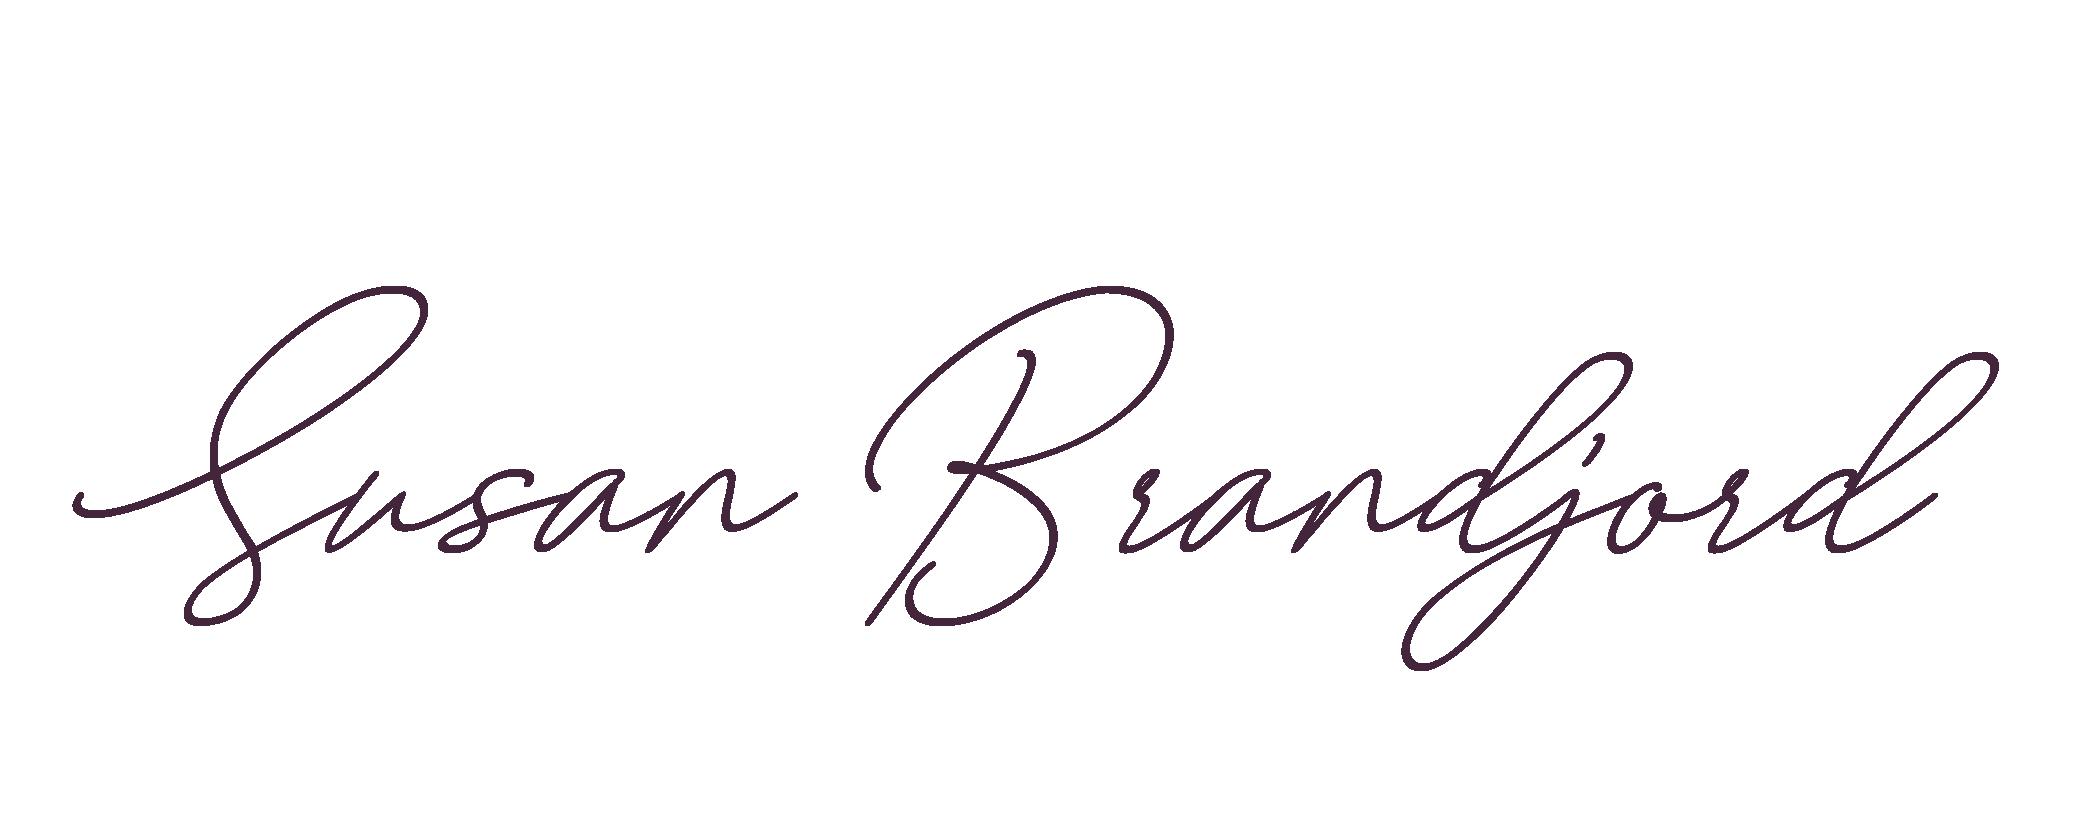 Names-02.png